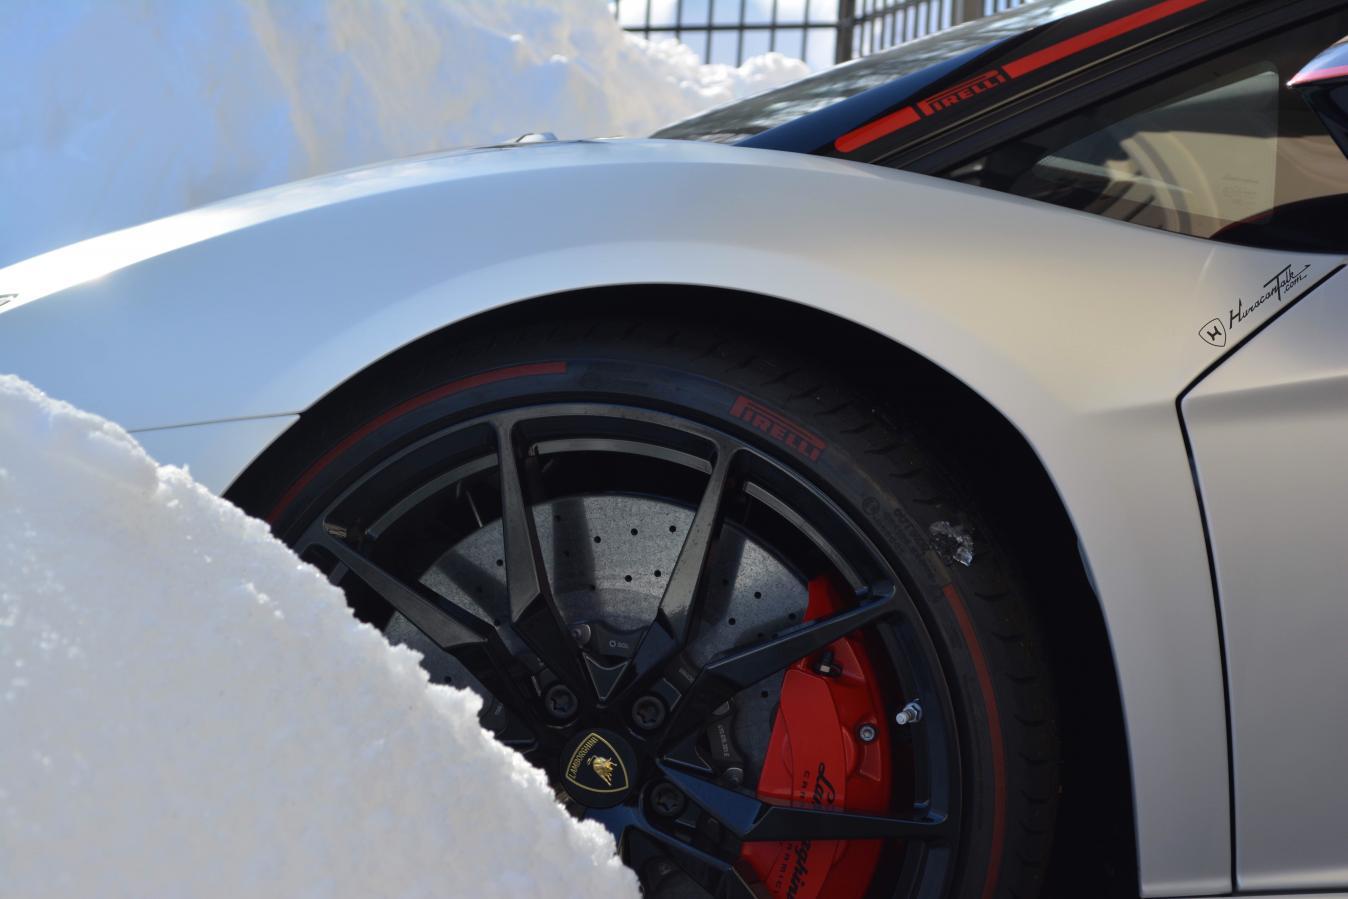 Lamborghini Aventador Pirelli Edition meets Snowzilla-photo-27-01-2016-12-11-28-jpg